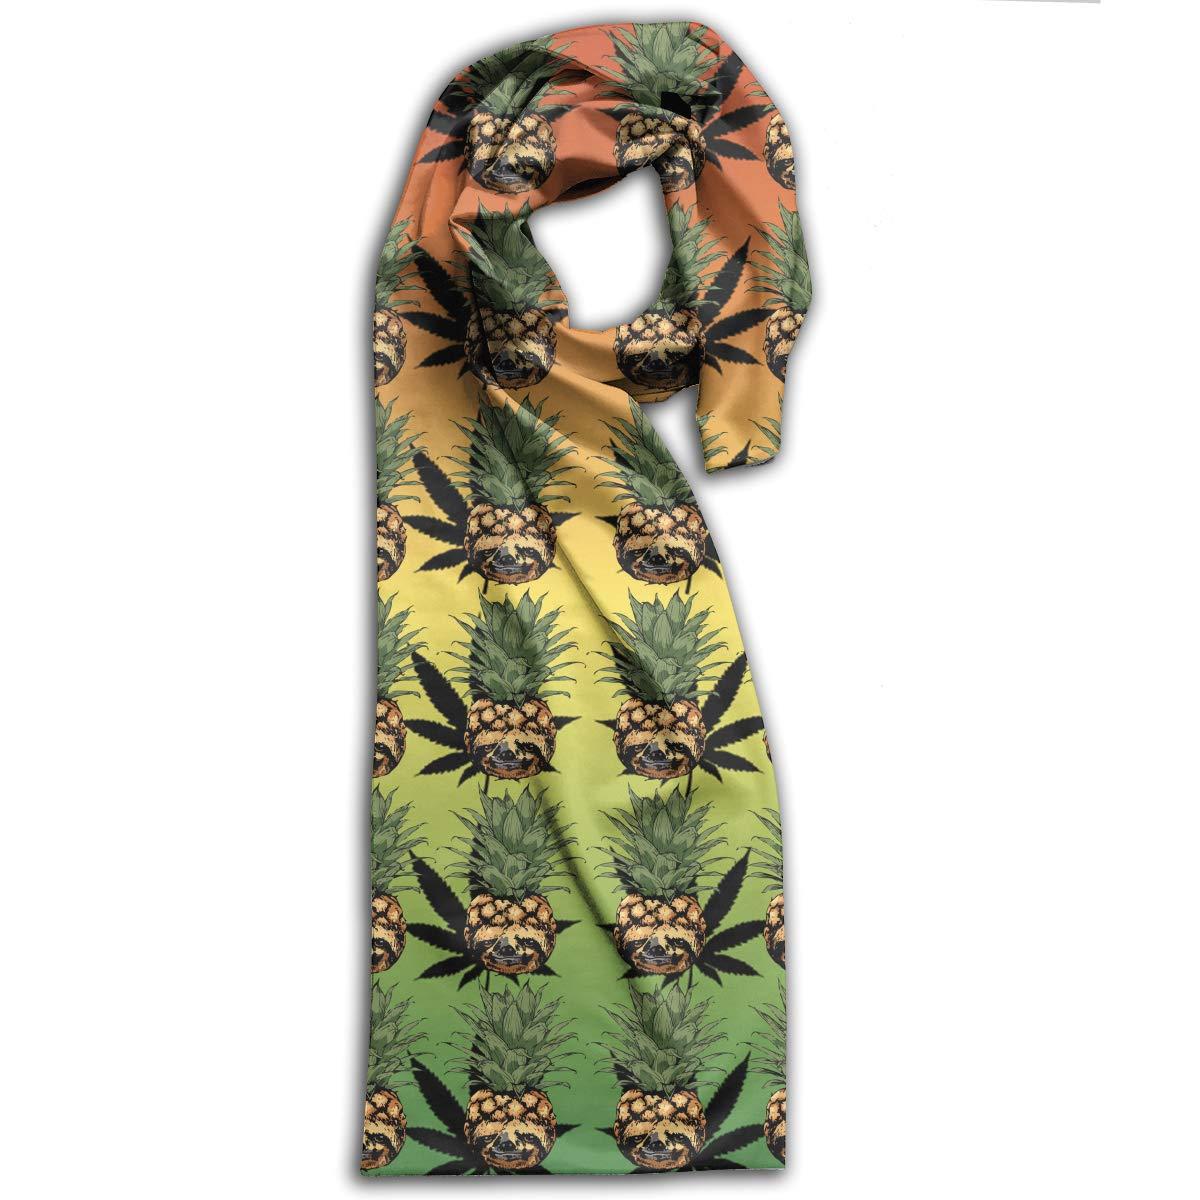 Cannabis Skull Pineapple Unisex Fashion Scarf Versatile Head Wrap